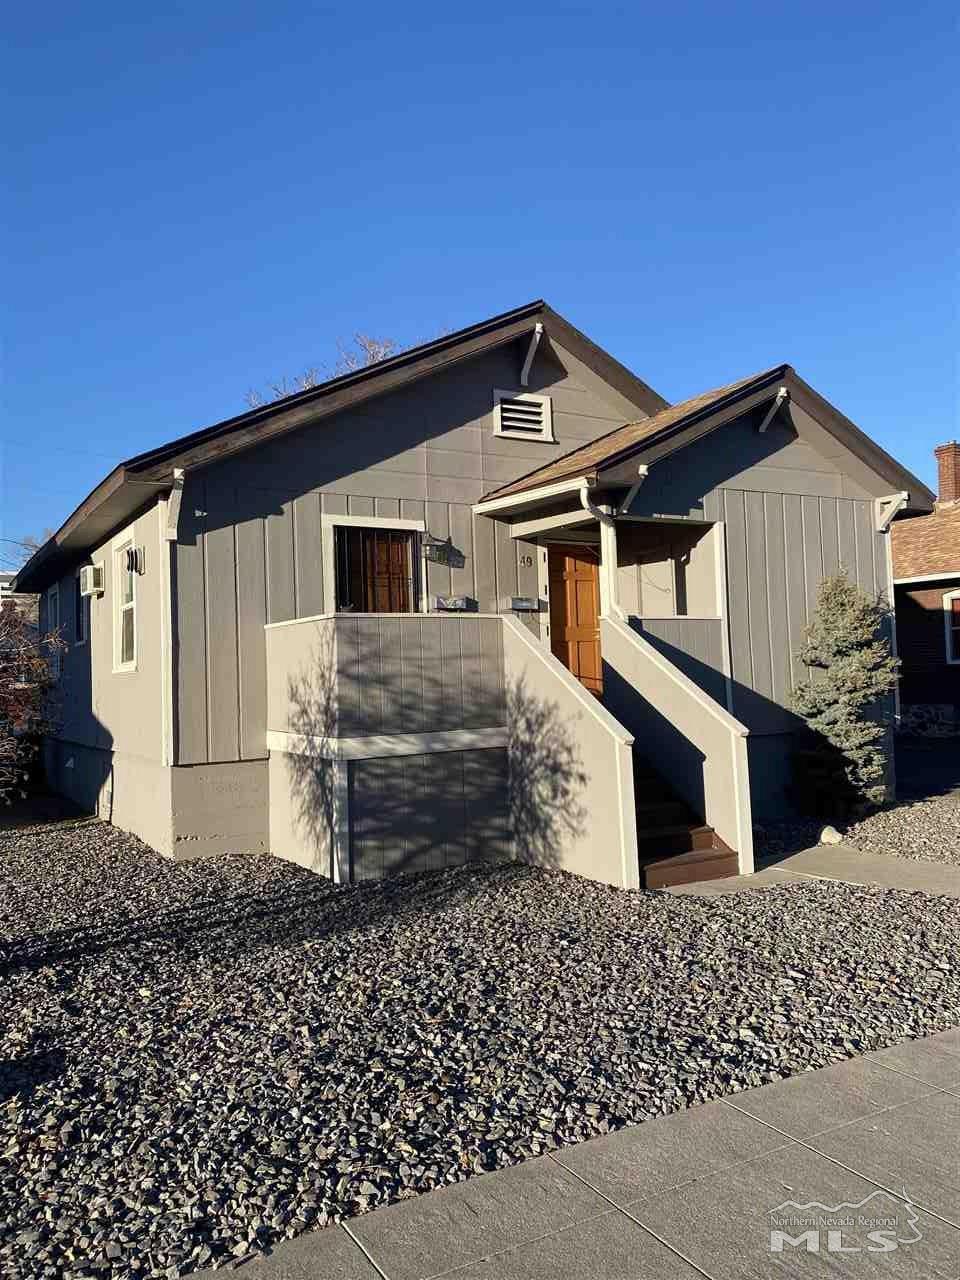 Image for 43/49 W Taylor, Reno, NV 89509-1715